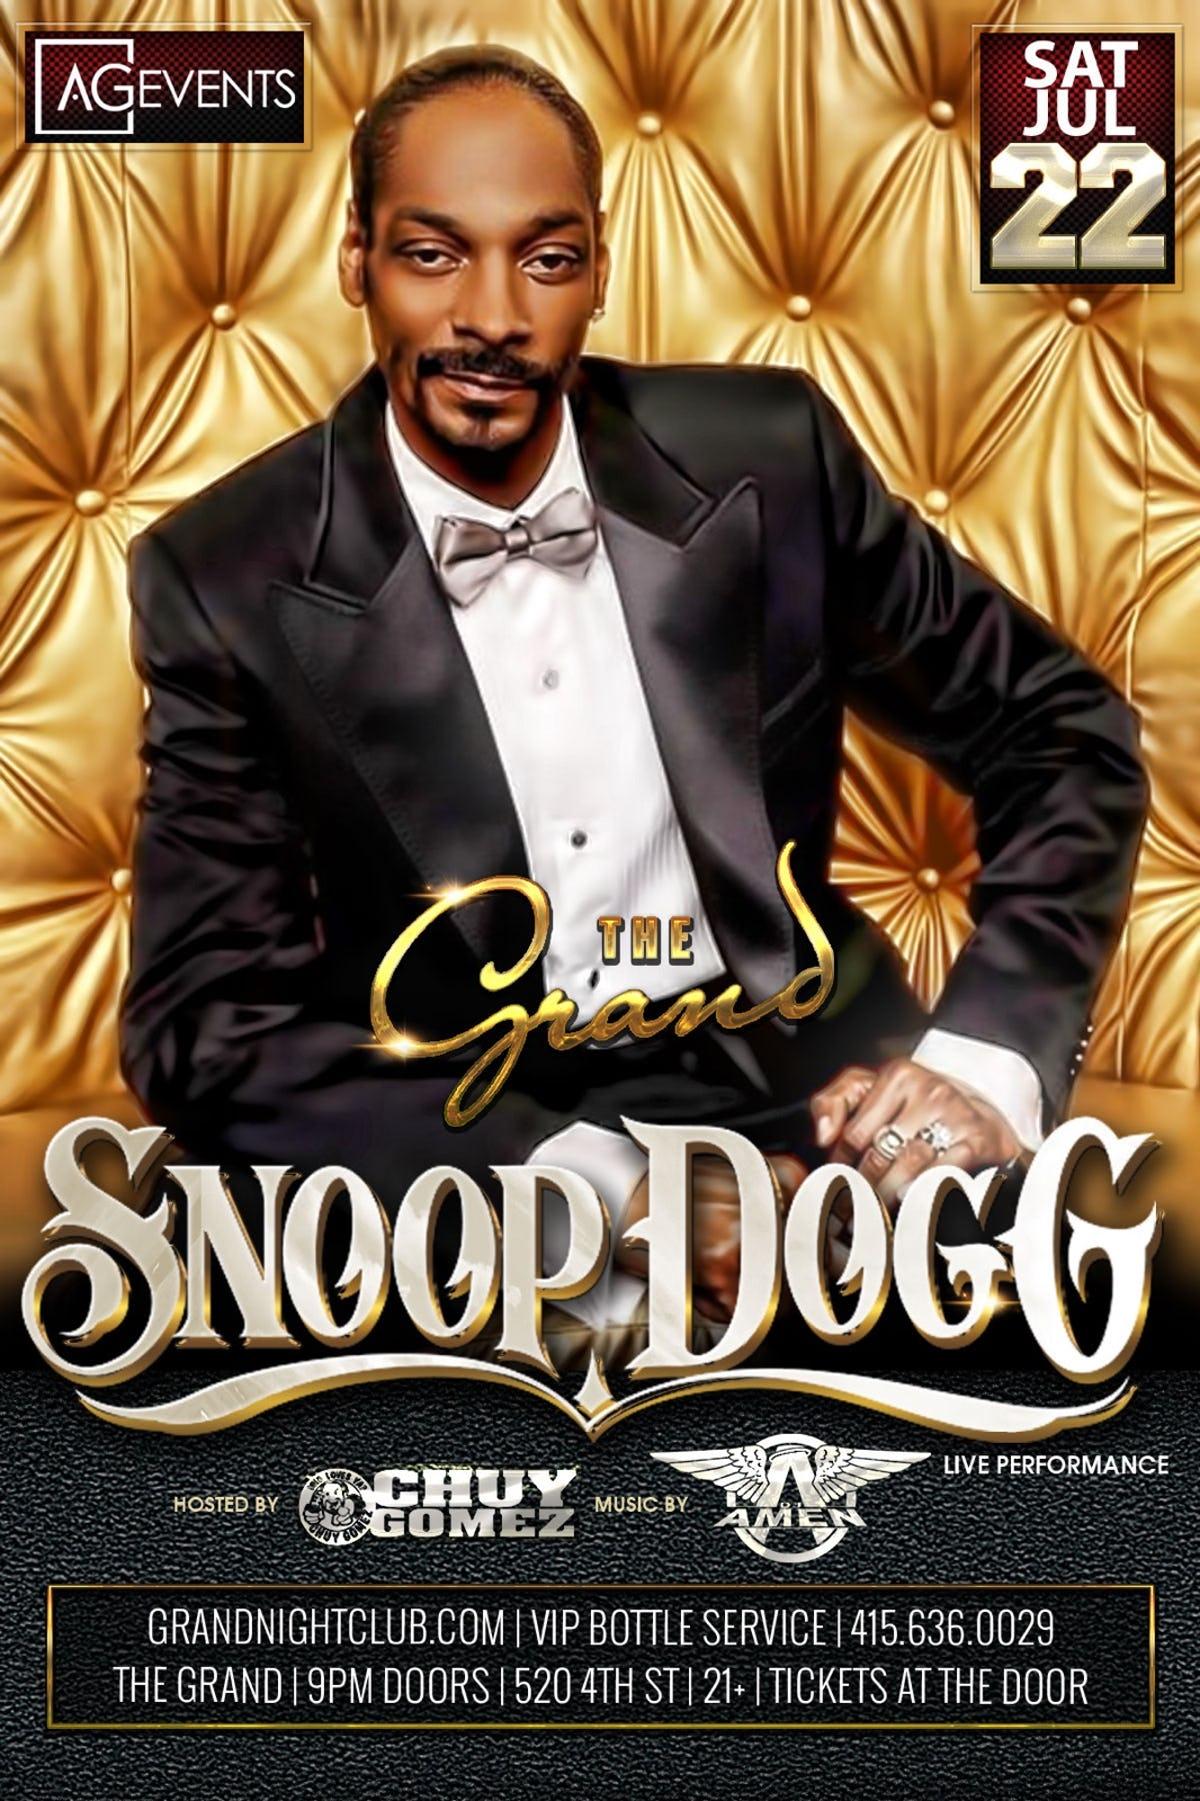 Snoop Dogg Saturday At The Grand Saturday Jul 22 Guestlist